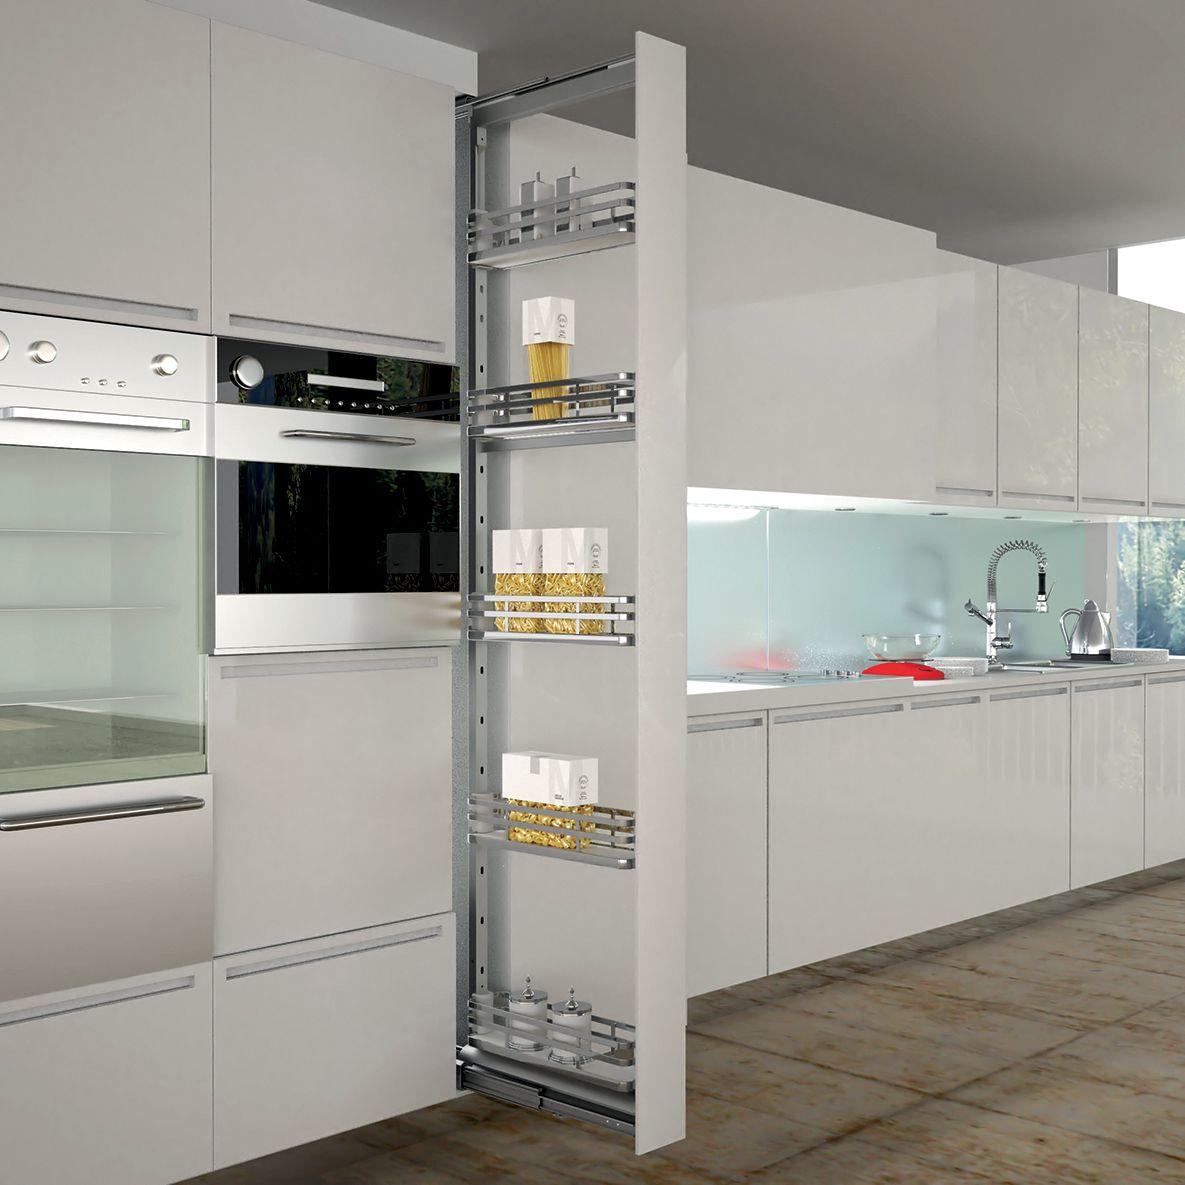 armoire coulissante rangement pices cuisines teisseire. Black Bedroom Furniture Sets. Home Design Ideas